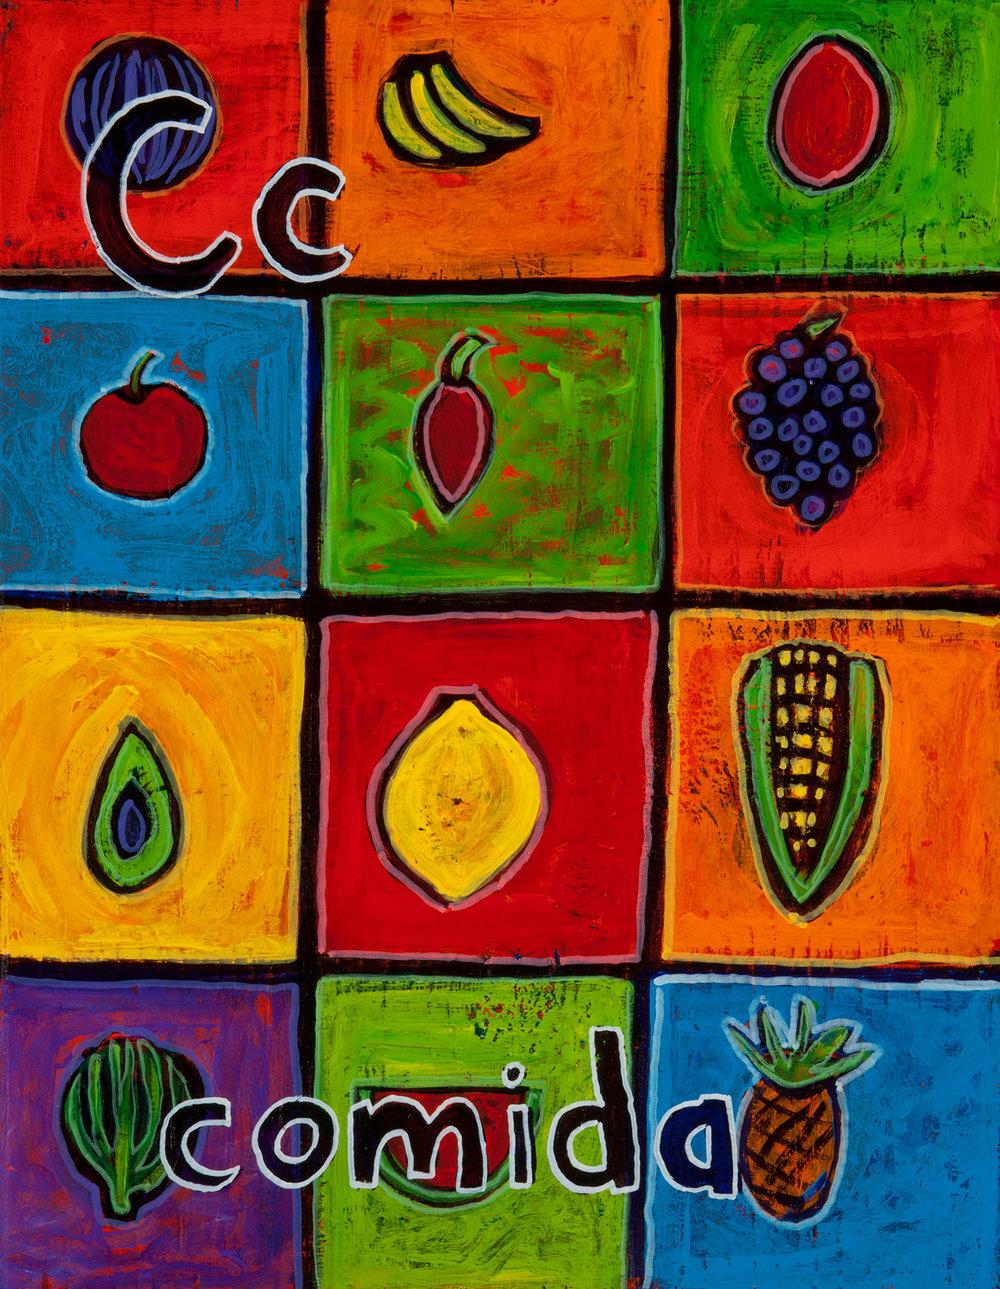 (C), comida, 2011